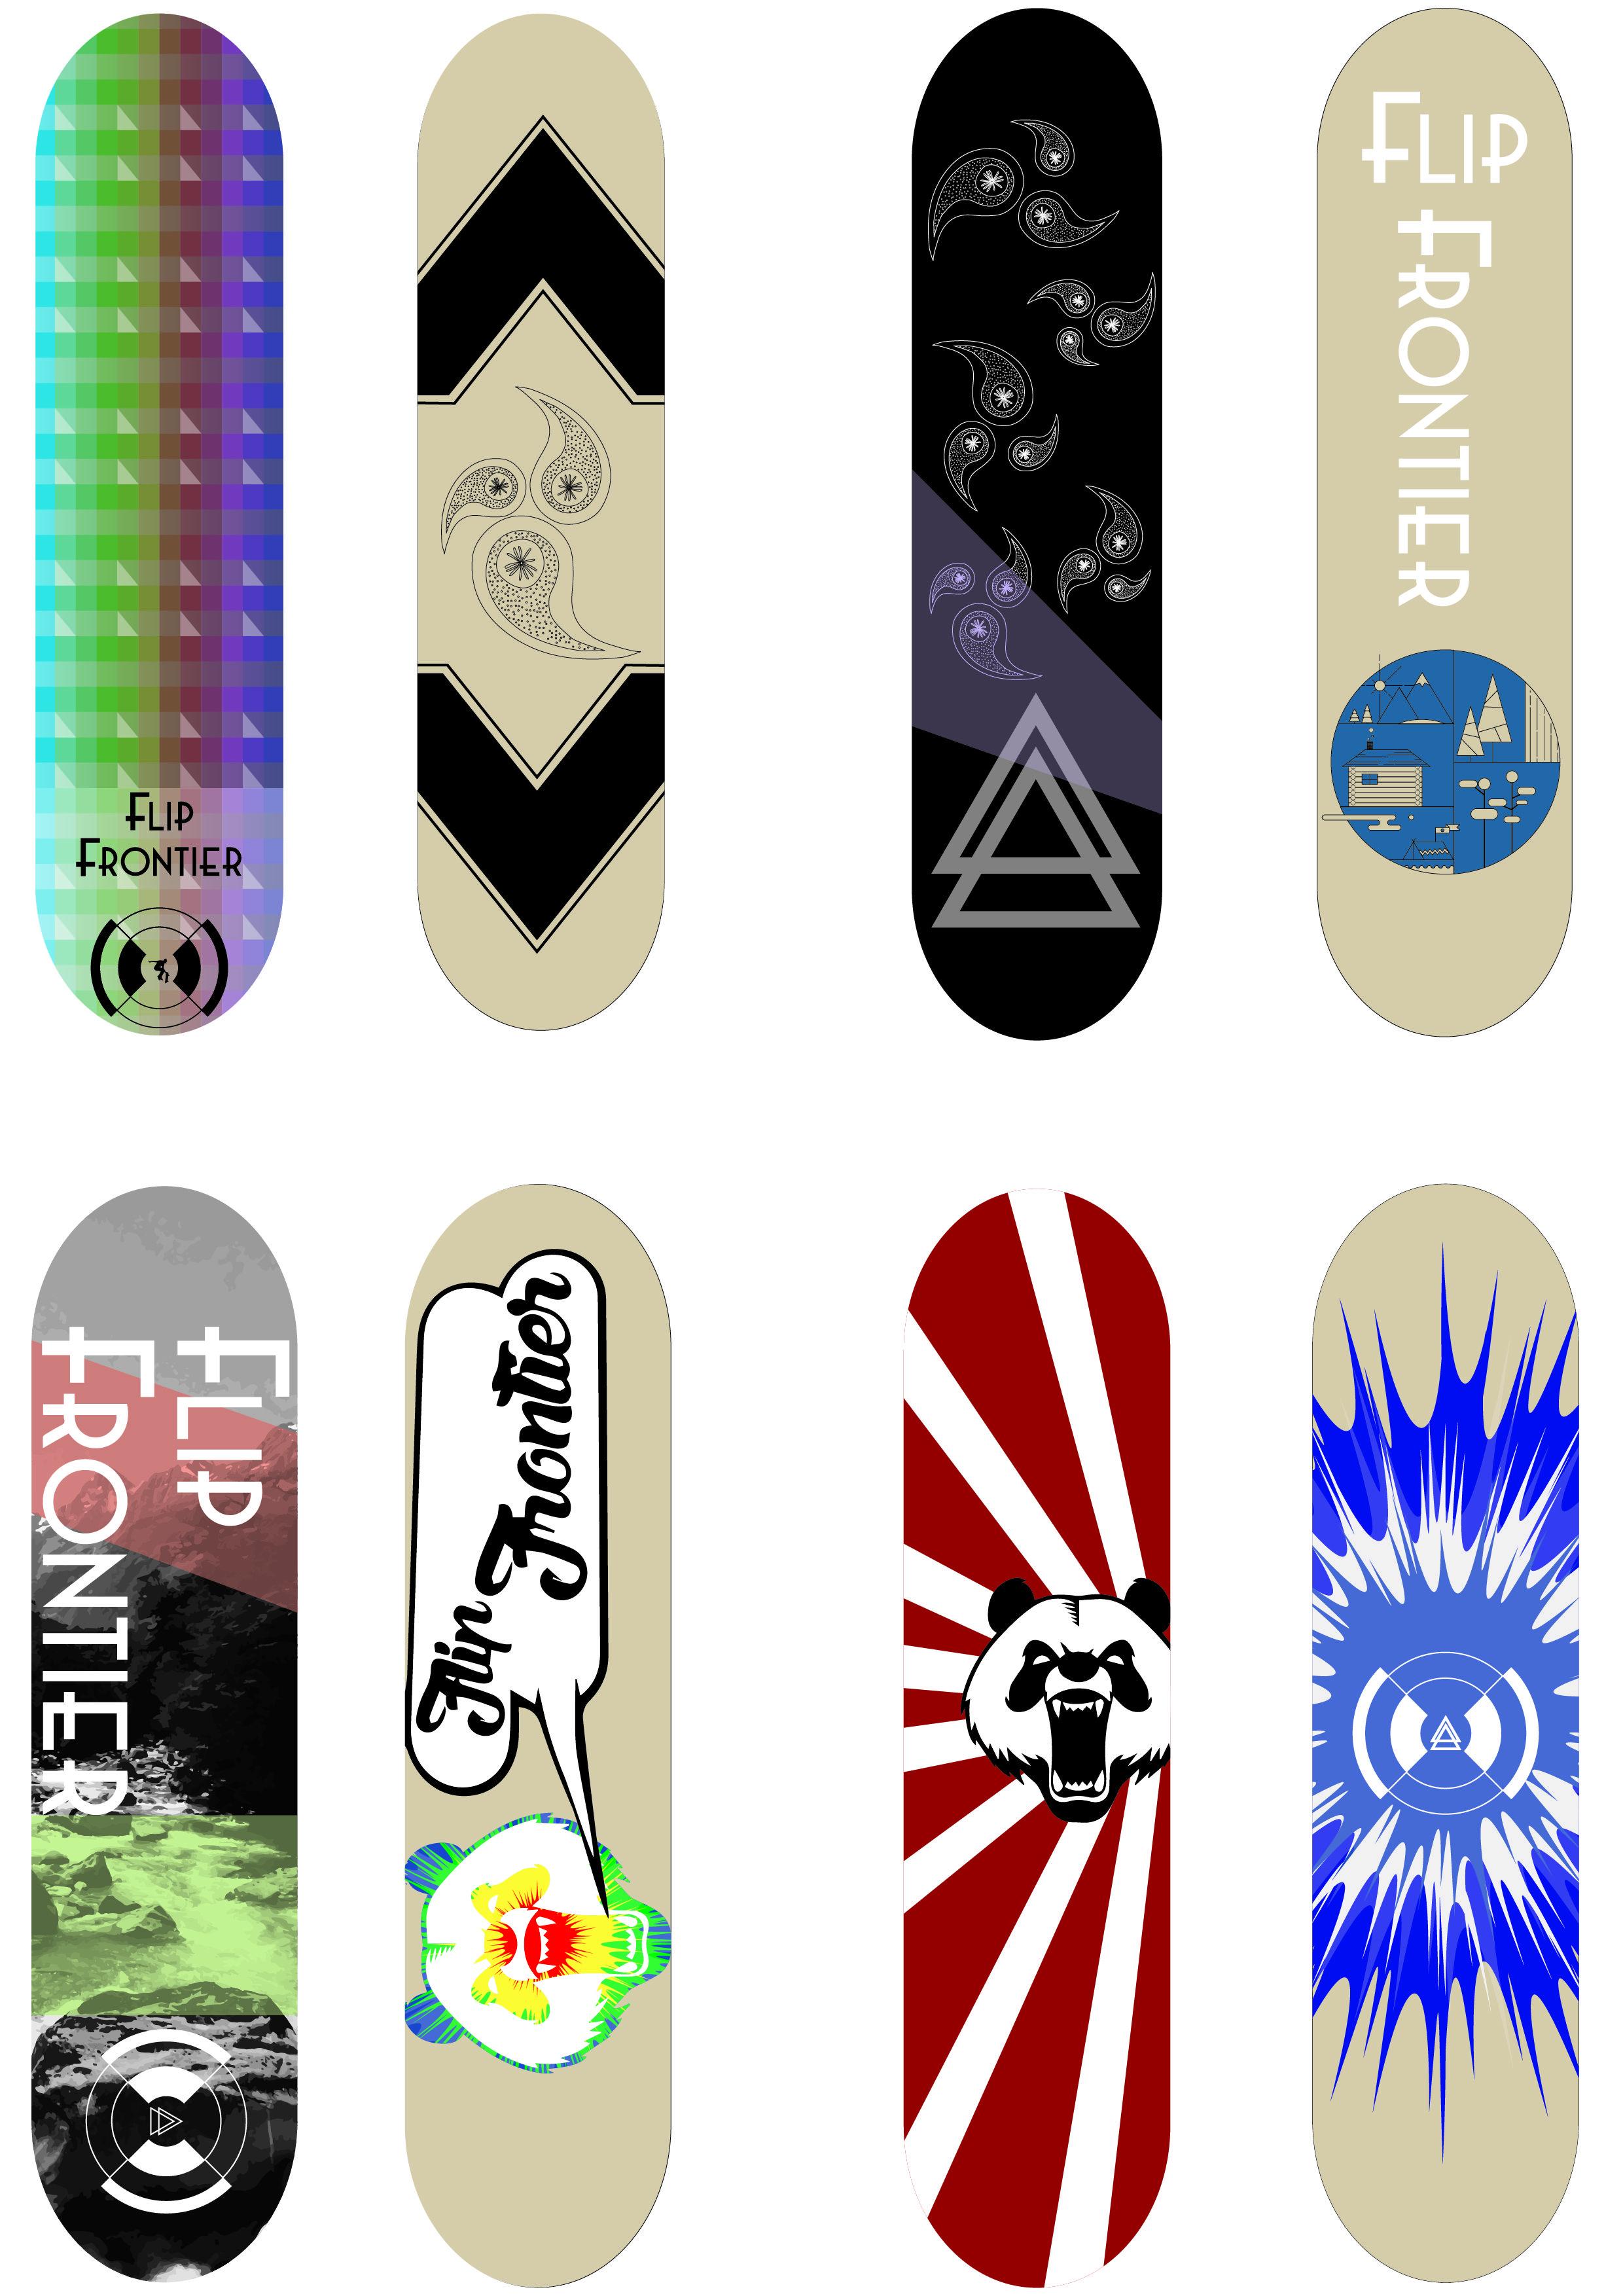 I designed some skateboards yeah skateboard art my